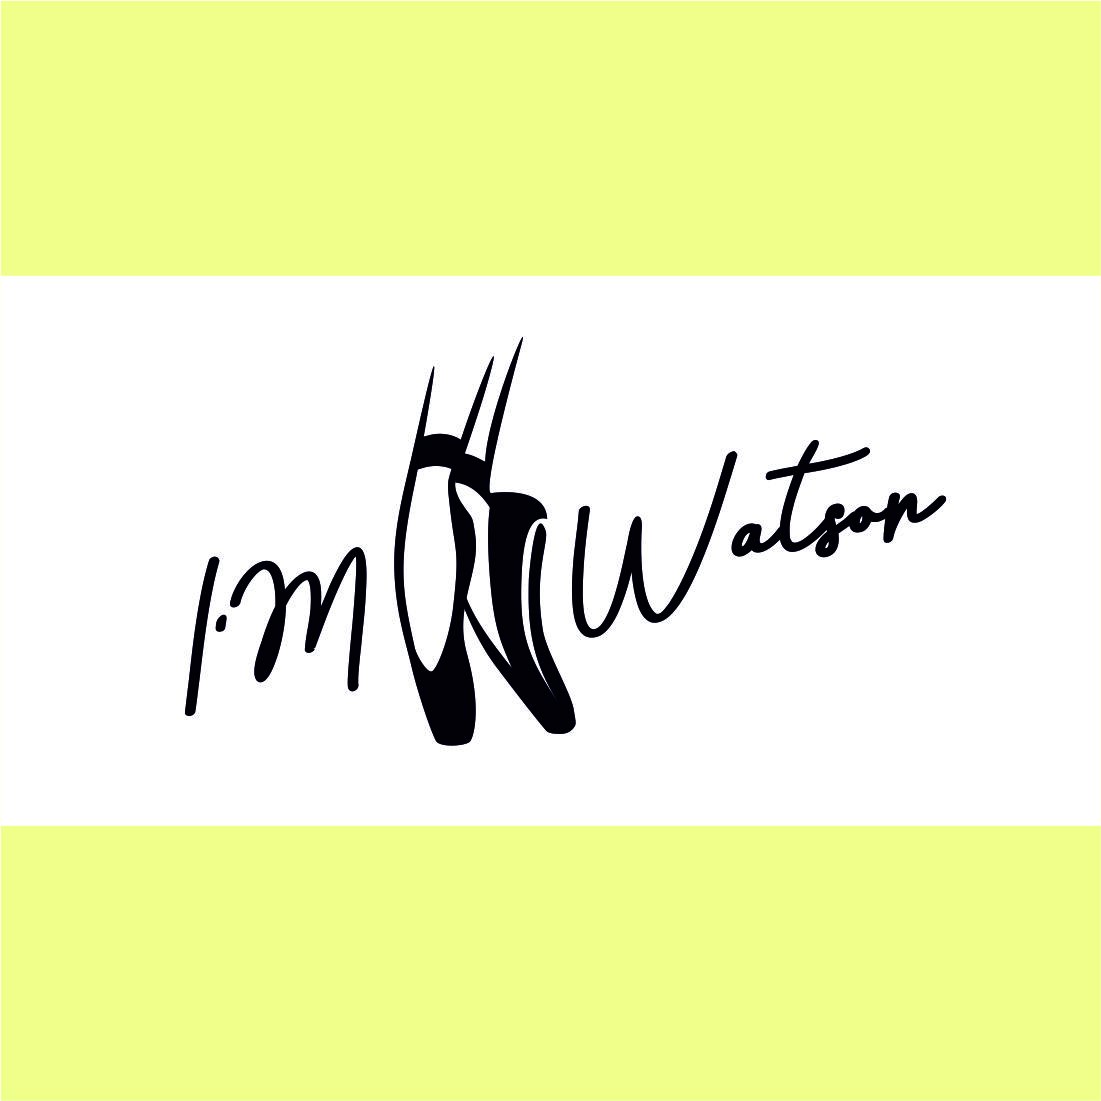 Разработать логотип для балетного бренда фото f_6575bc2133414781.jpg